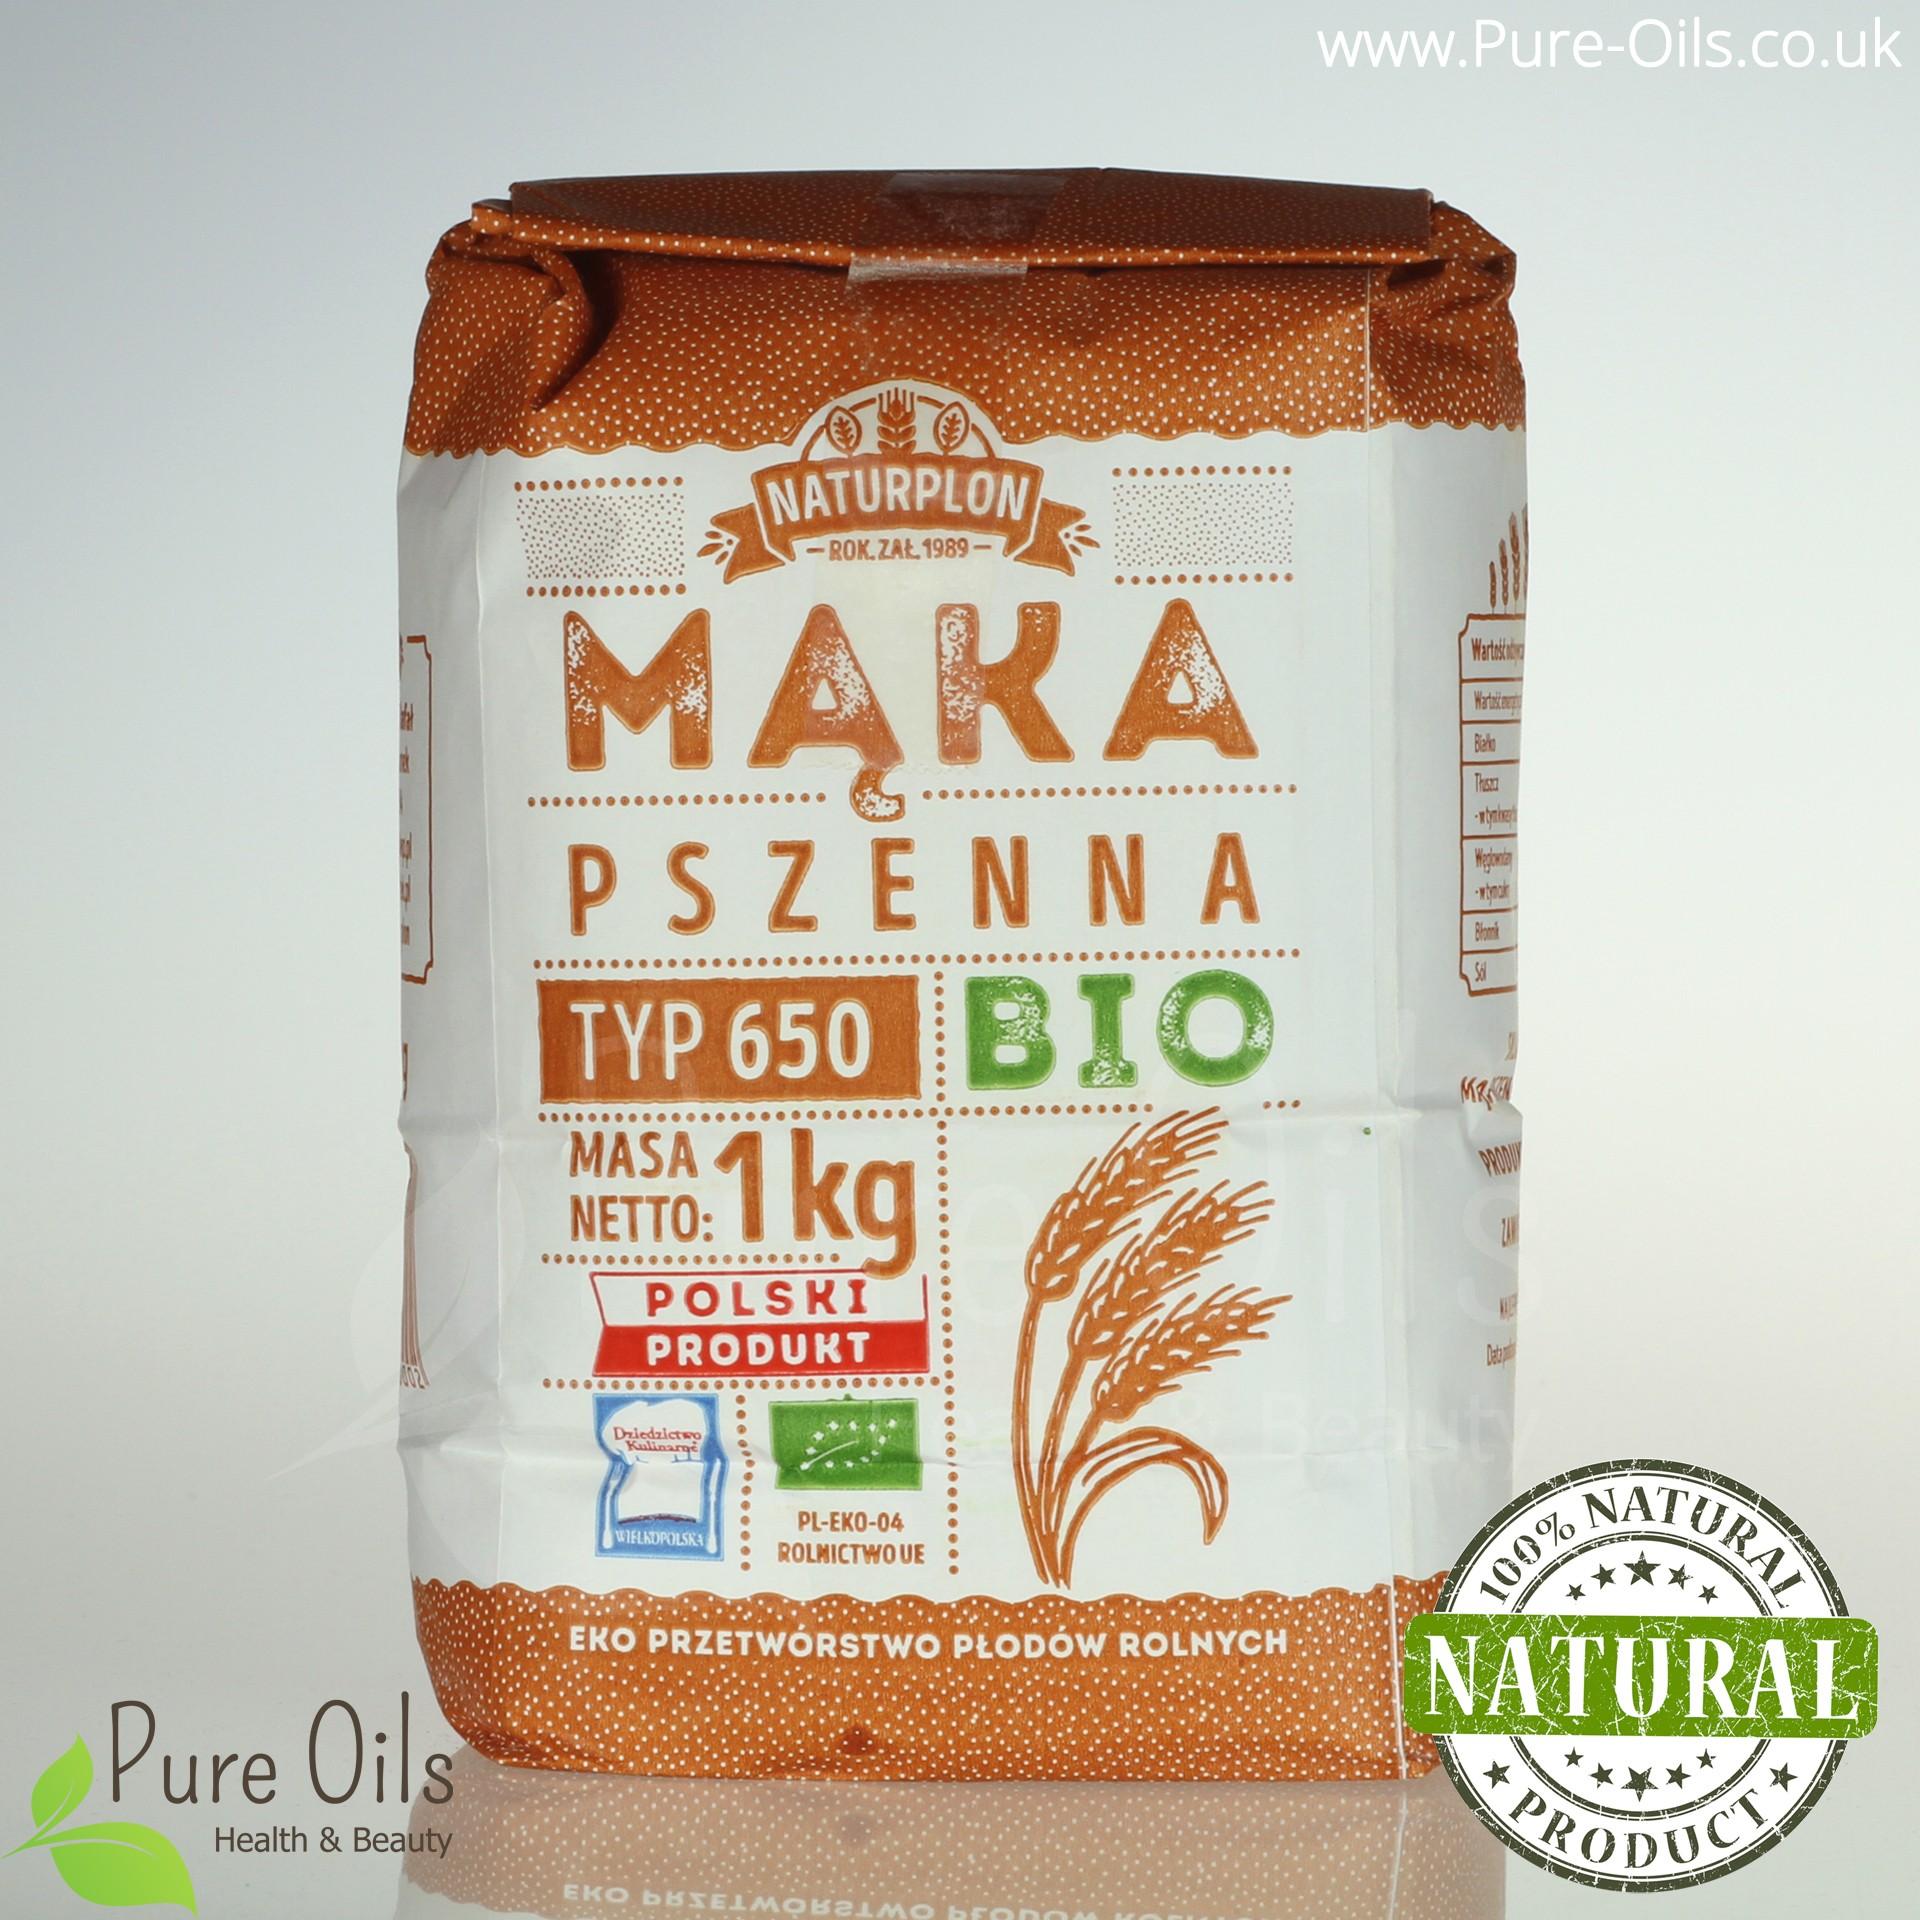 Mąka Pszenna, Typ 650 - Bio, Naturplon